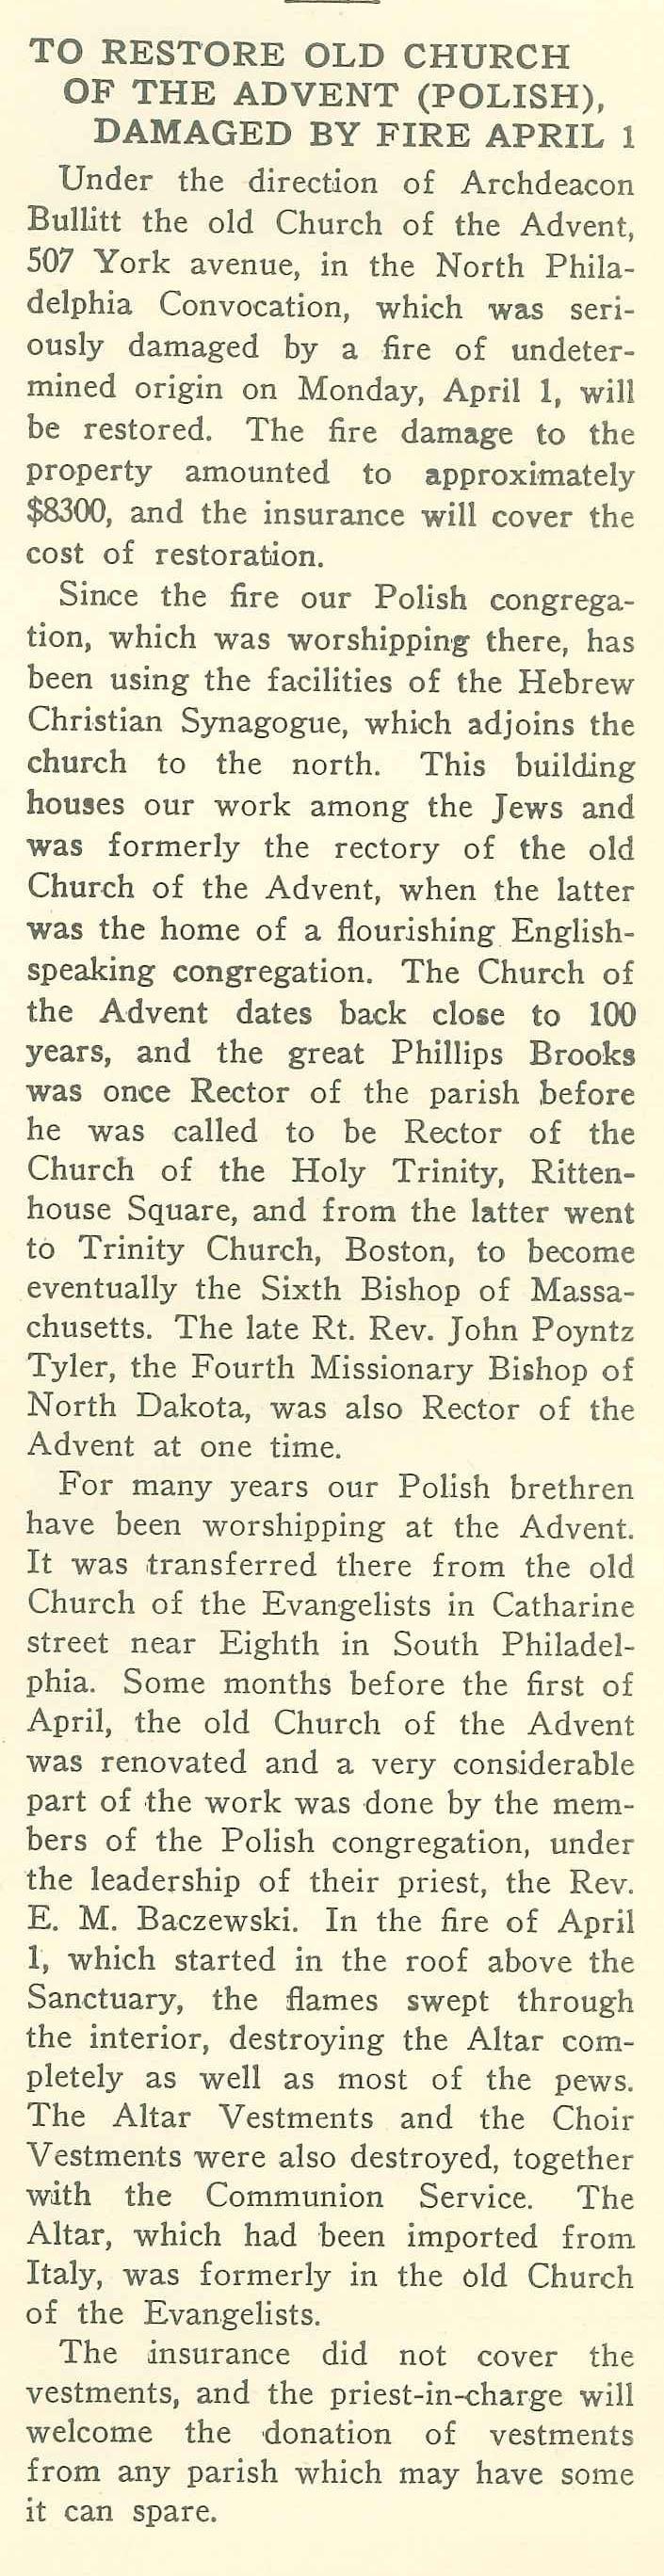 church of the advent philadelphia studies